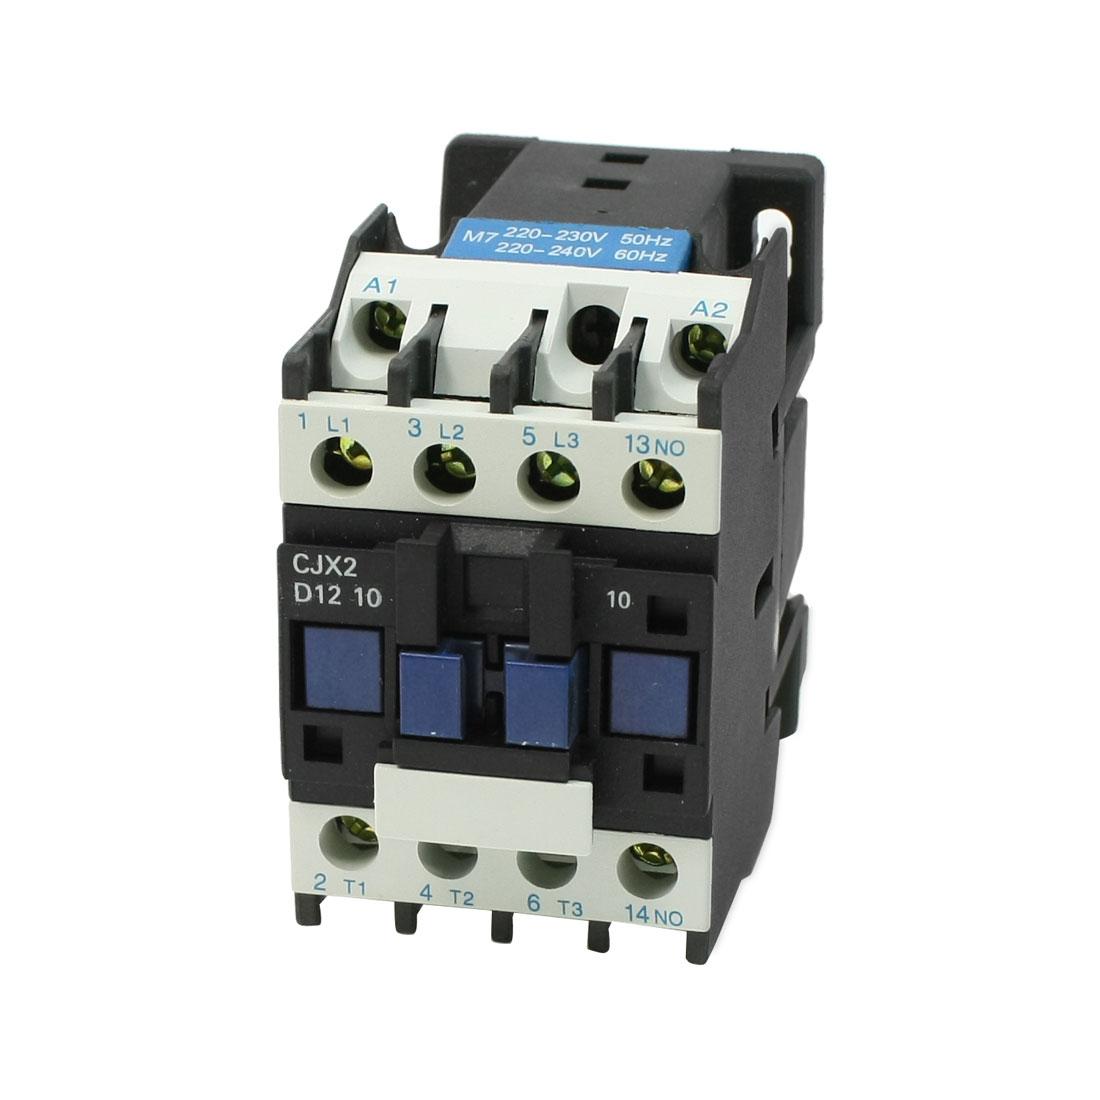 CJX2-12 220-230V 50Hz 3 Phase 1NO Motor Controller AC Contactor 660V 25A